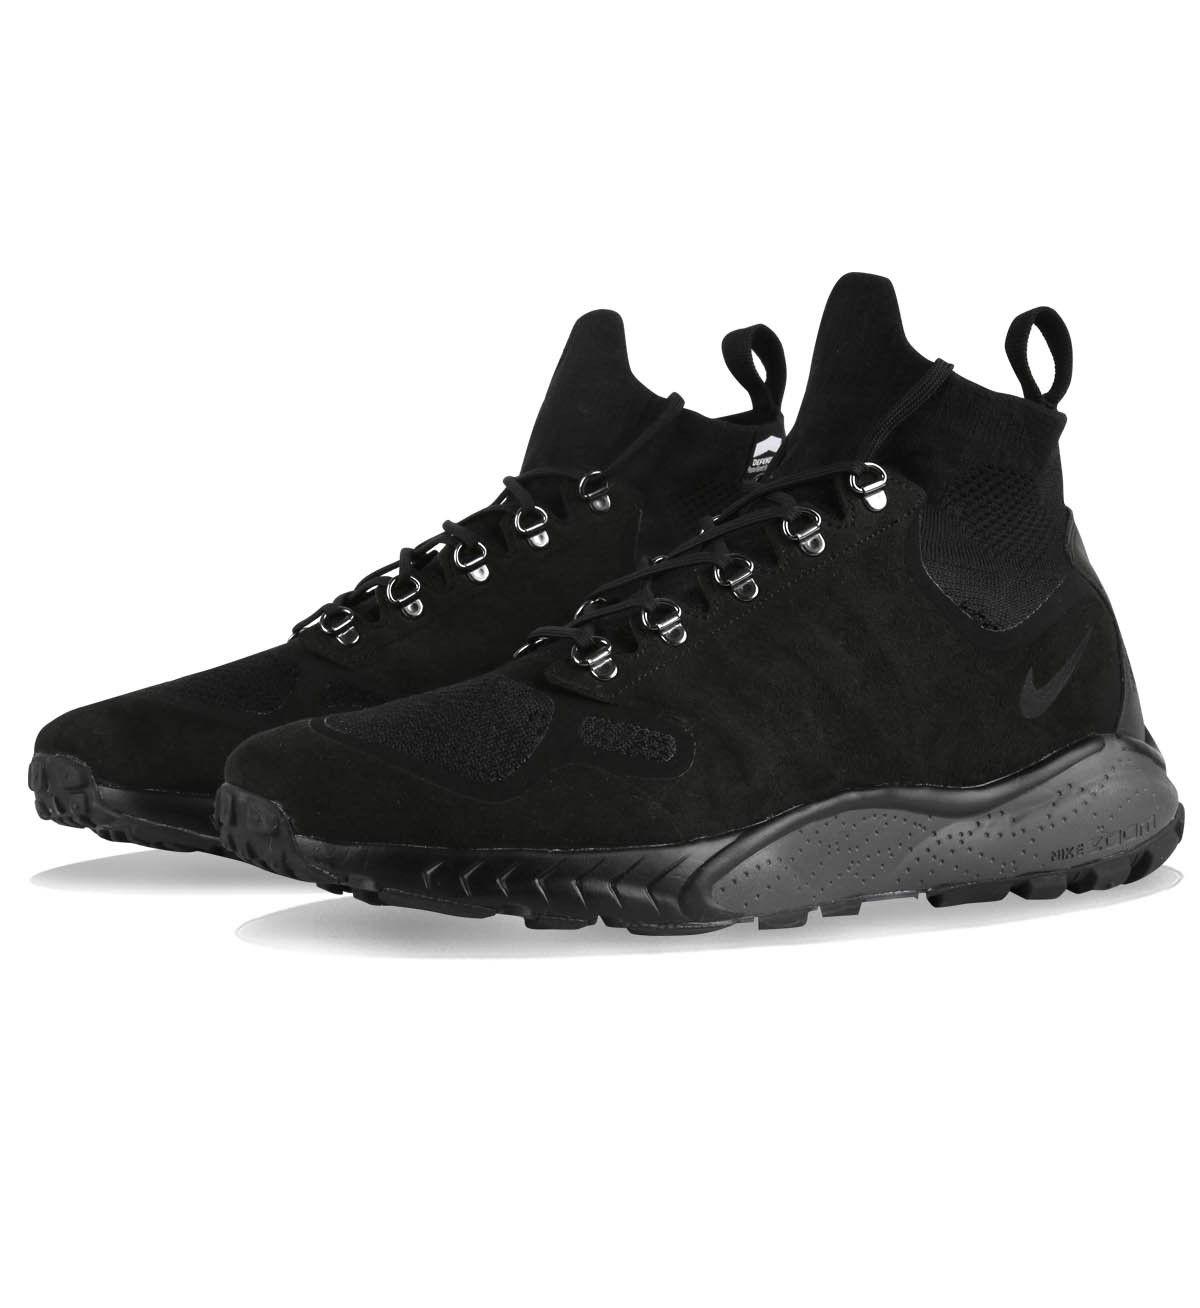 9937cf1143d0b Nike Zoom Talaria Mid Flyknit Black   Black   Dark Grey - Sale ...